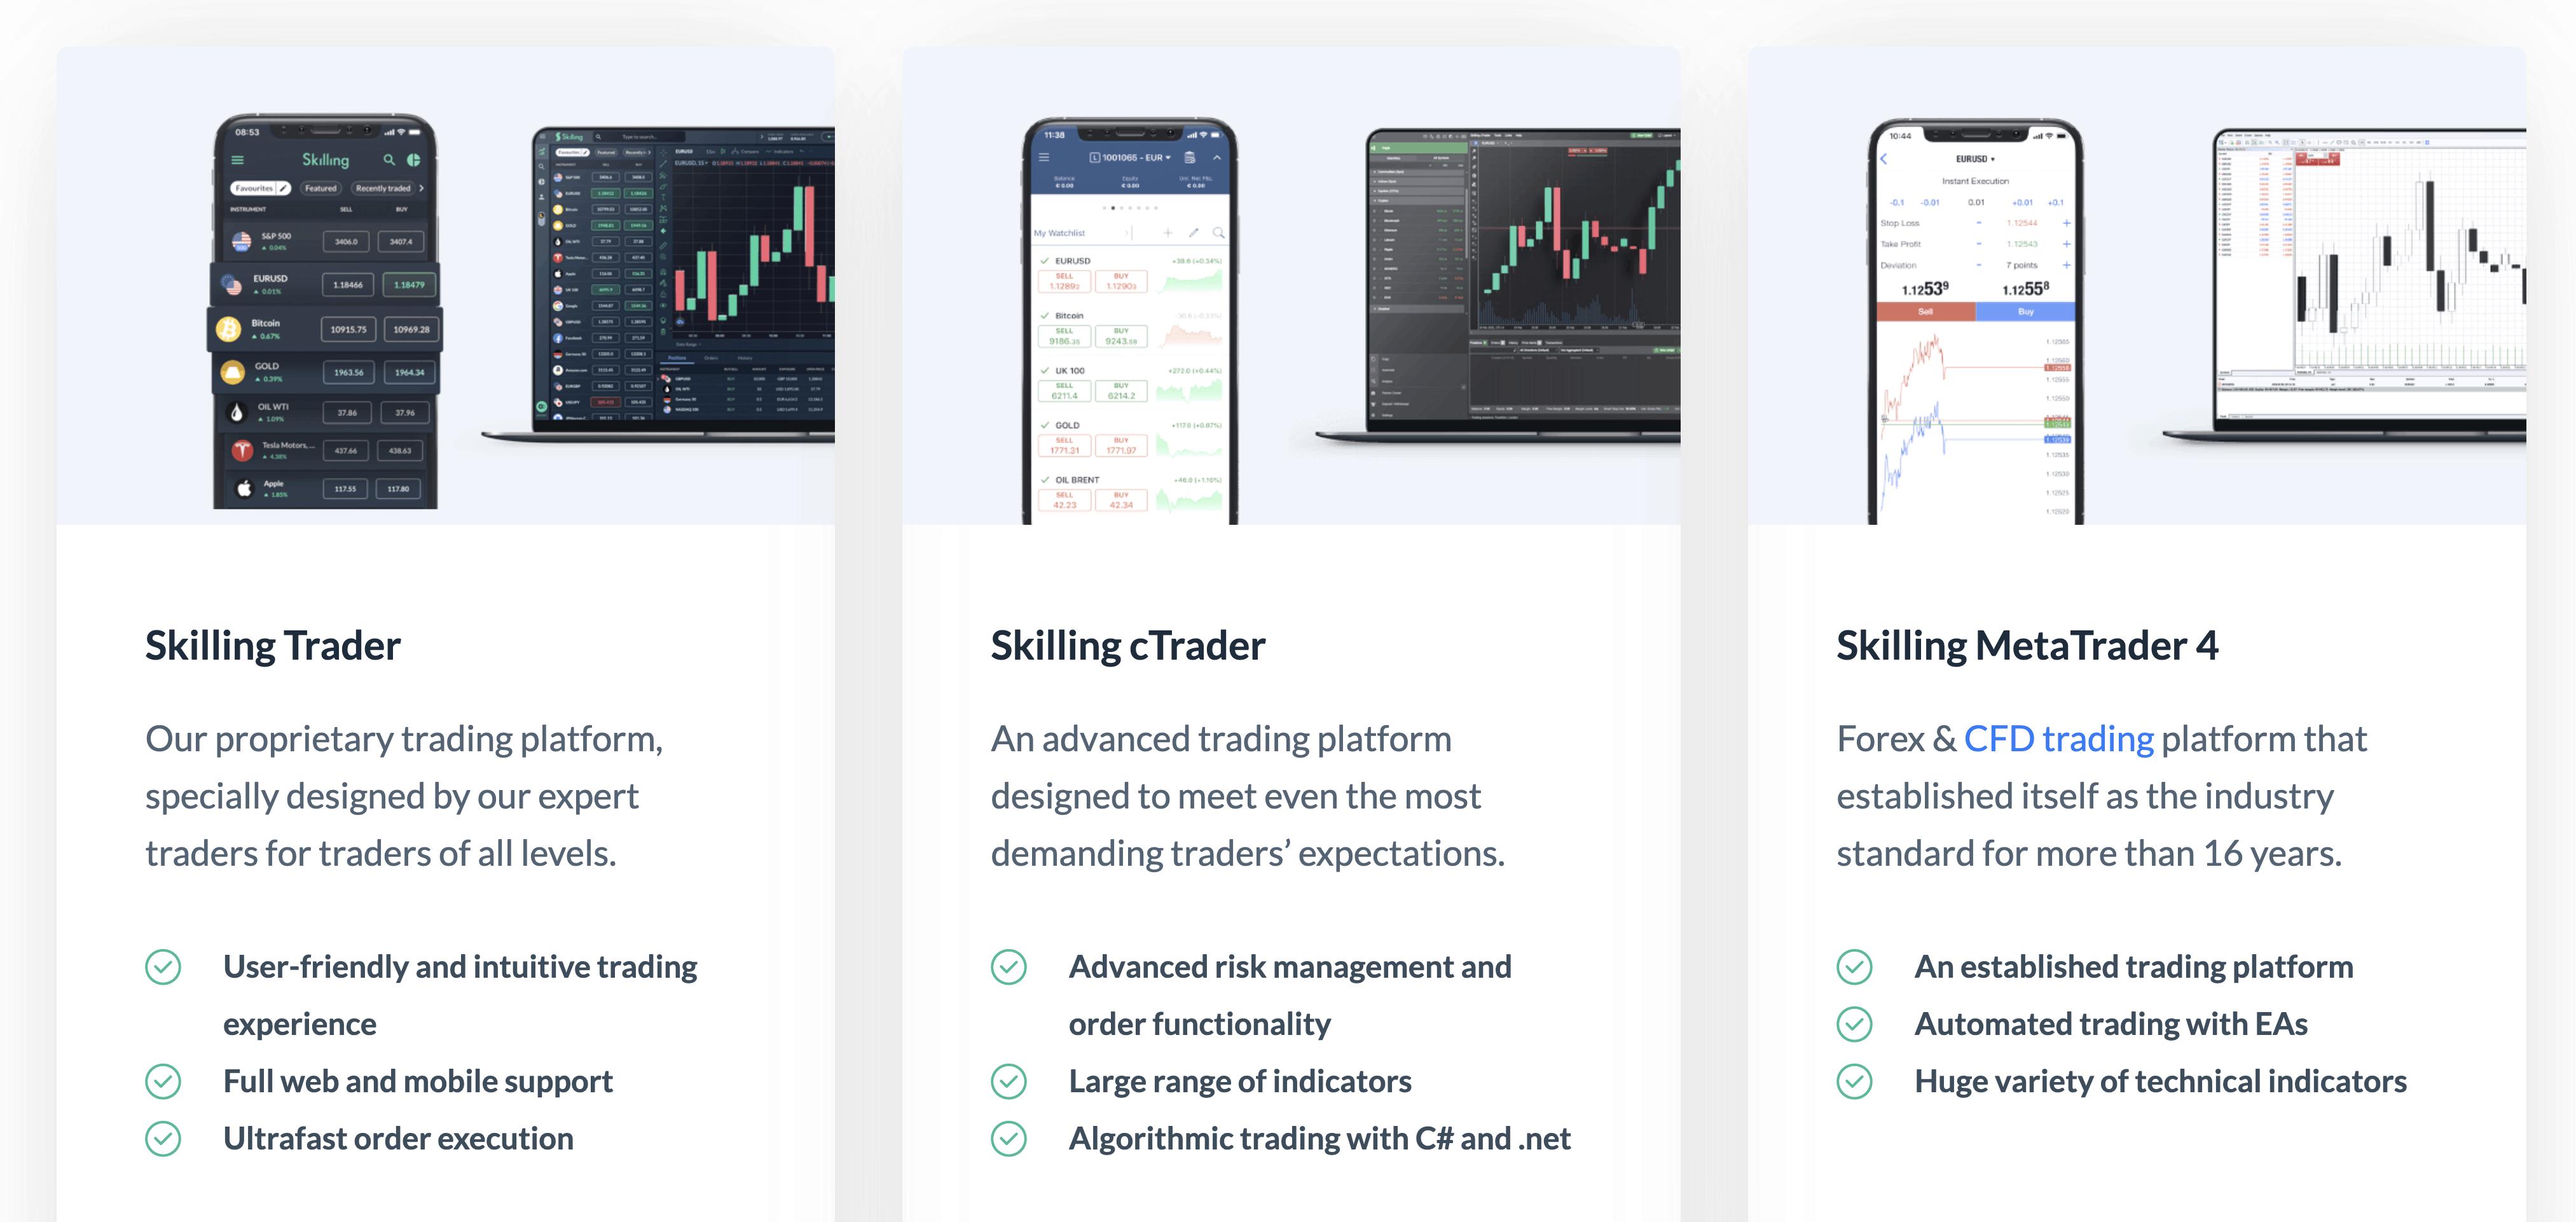 Skilling on 3 different trading platforms: Trader, cTrader, and MT4